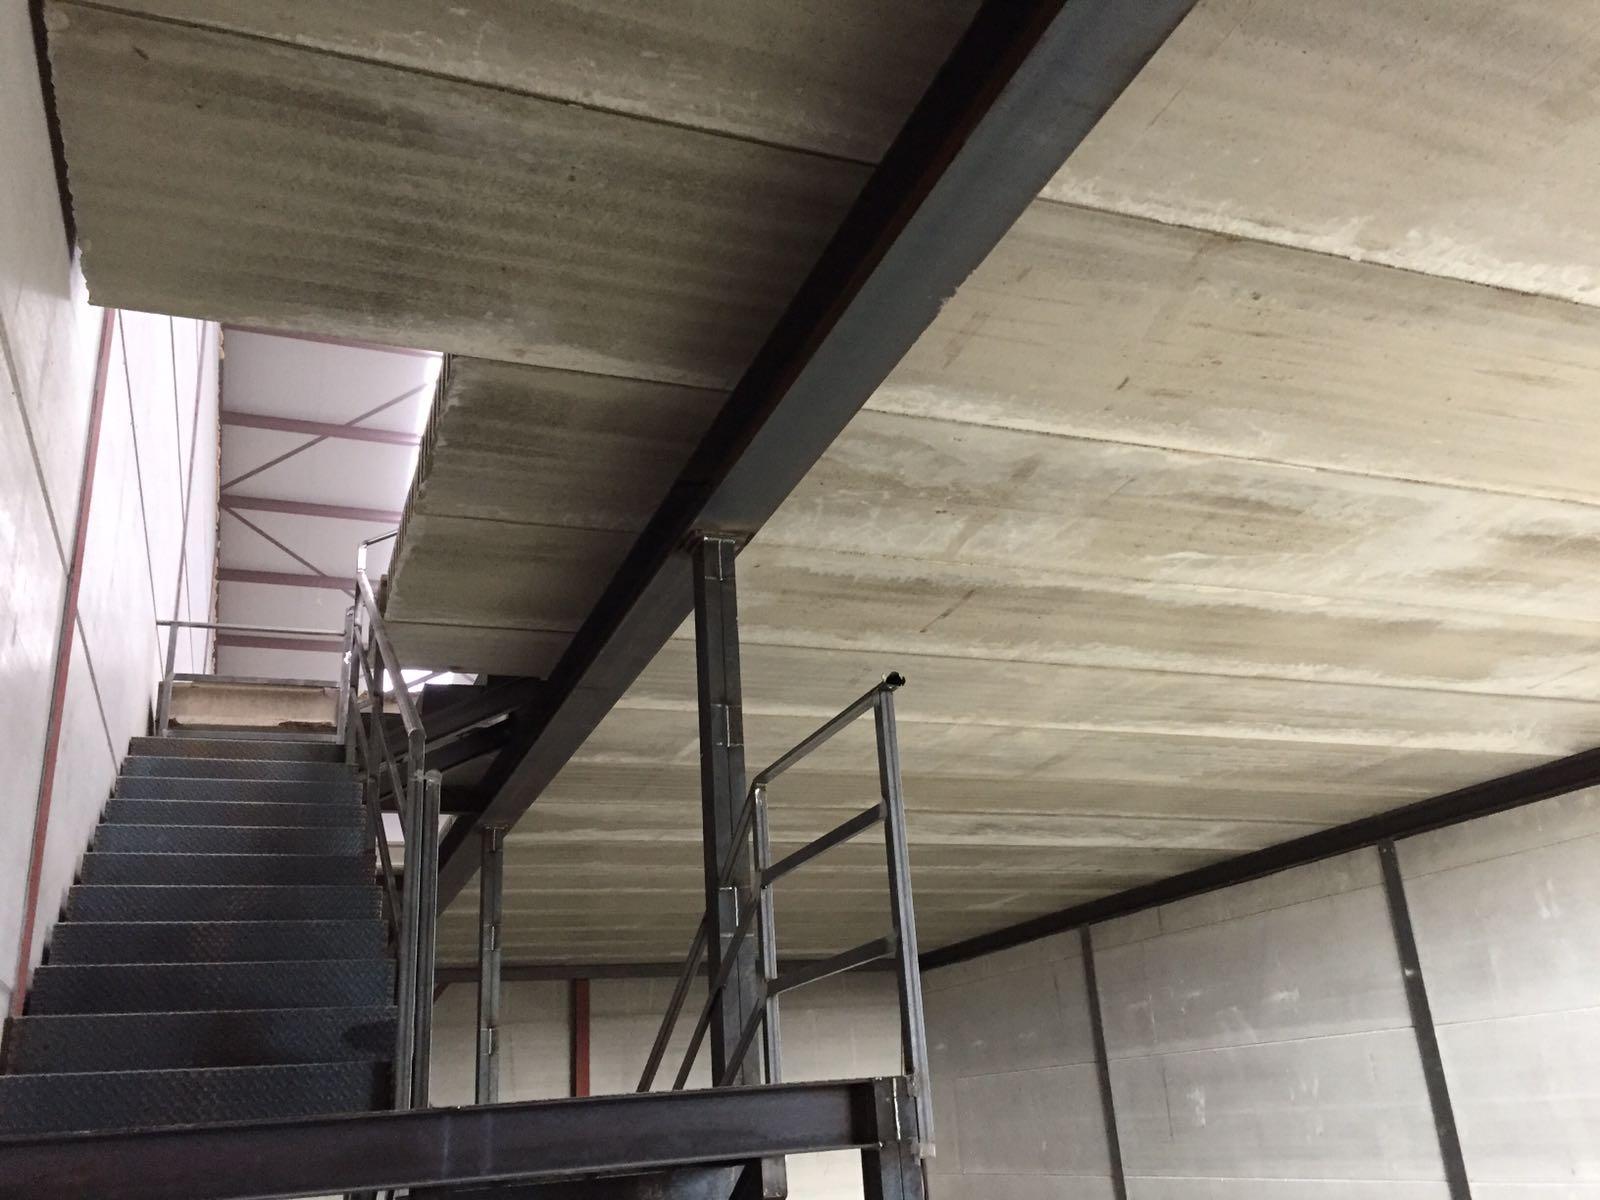 Toledo nave industrial en toledo forjado alveolar for Forjado estructura metalica